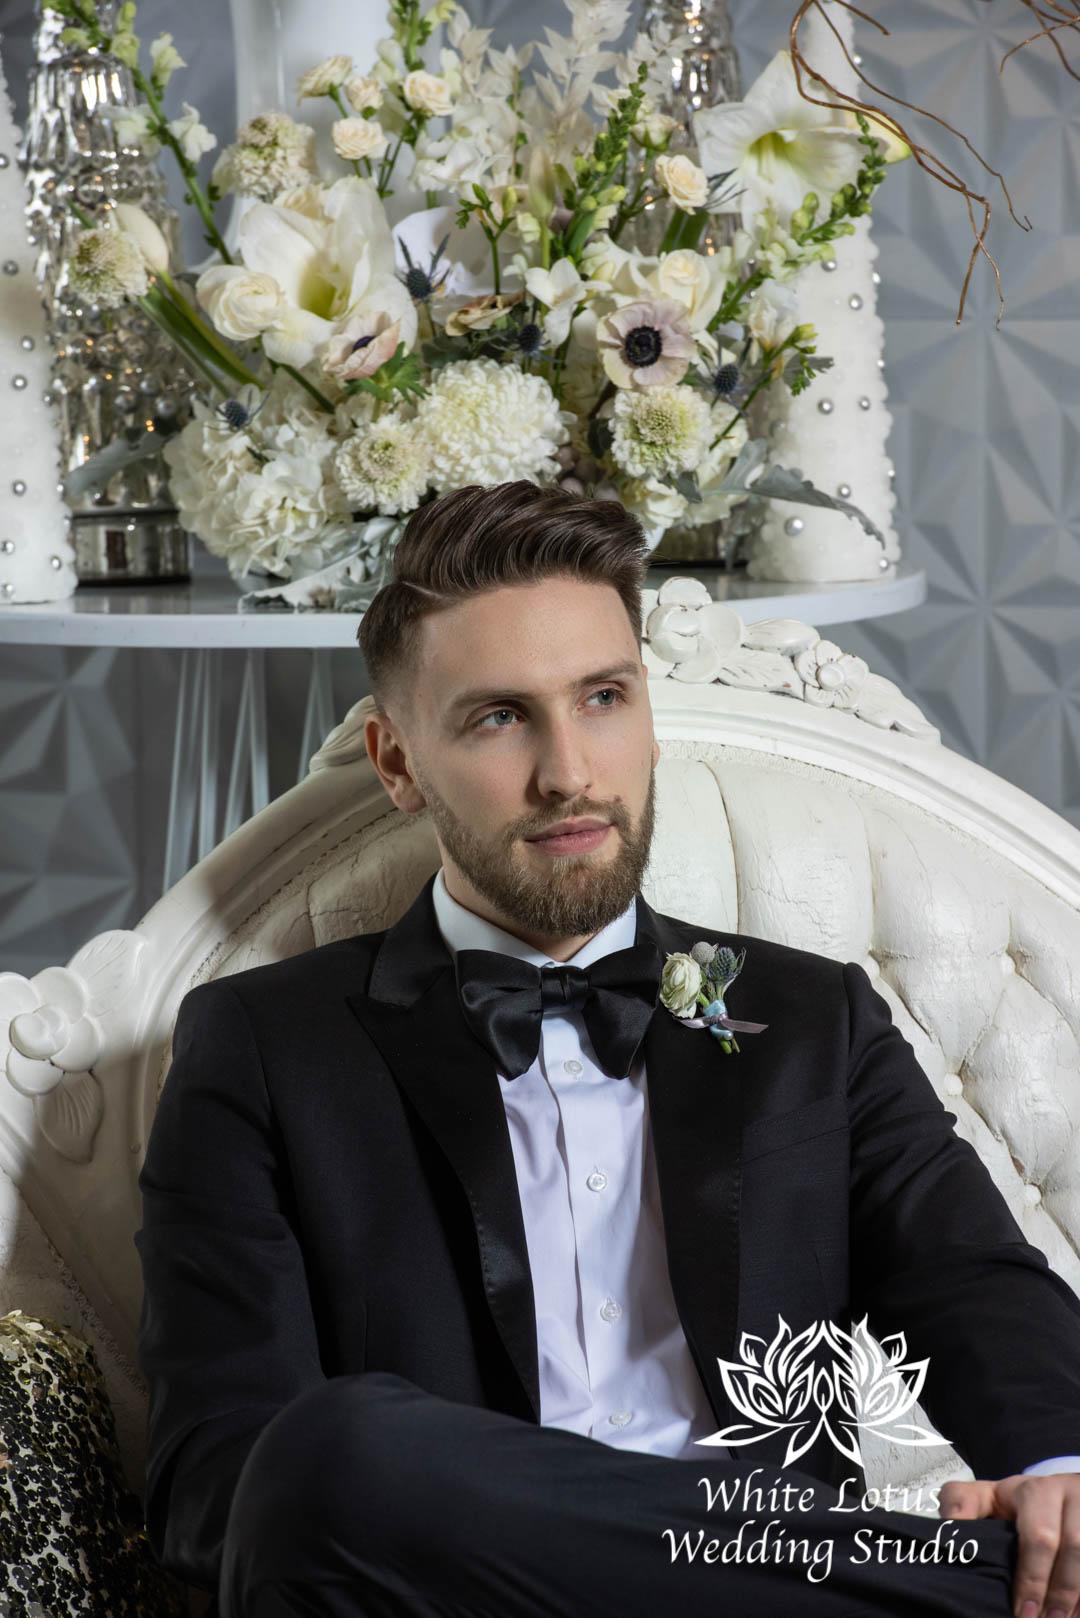 081- GLAM WINTERLUXE WEDDING INSPIRATION